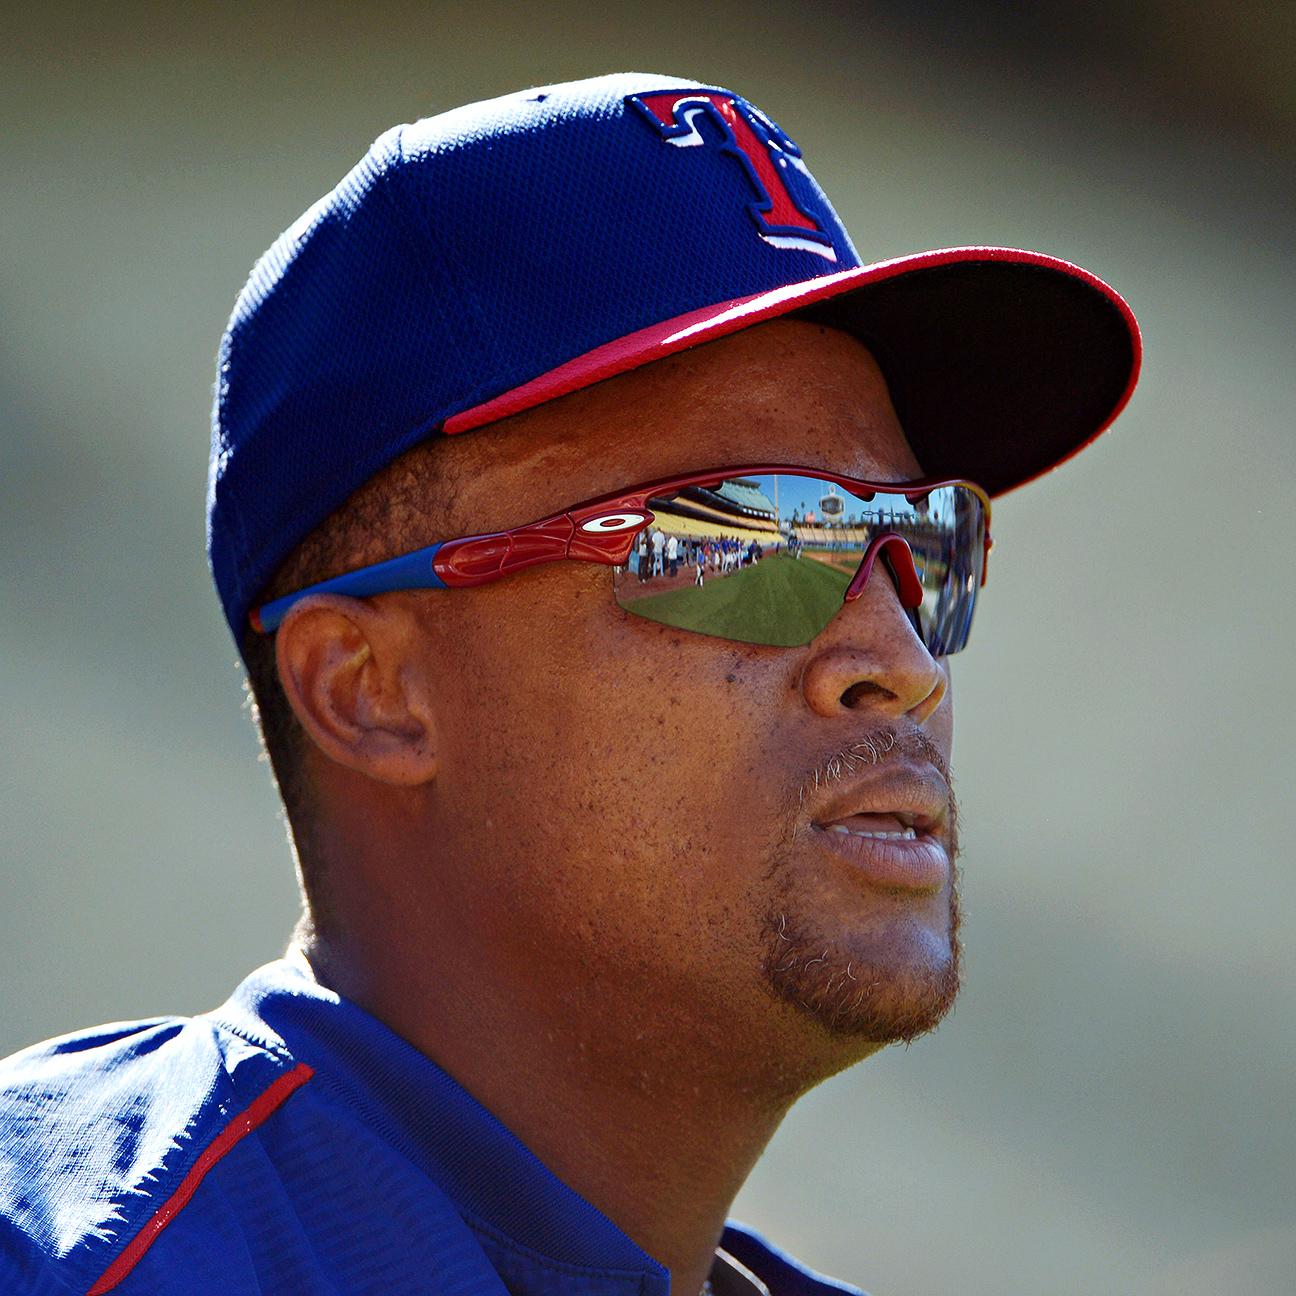 Rangers' Beltre skips workout to rest sore back